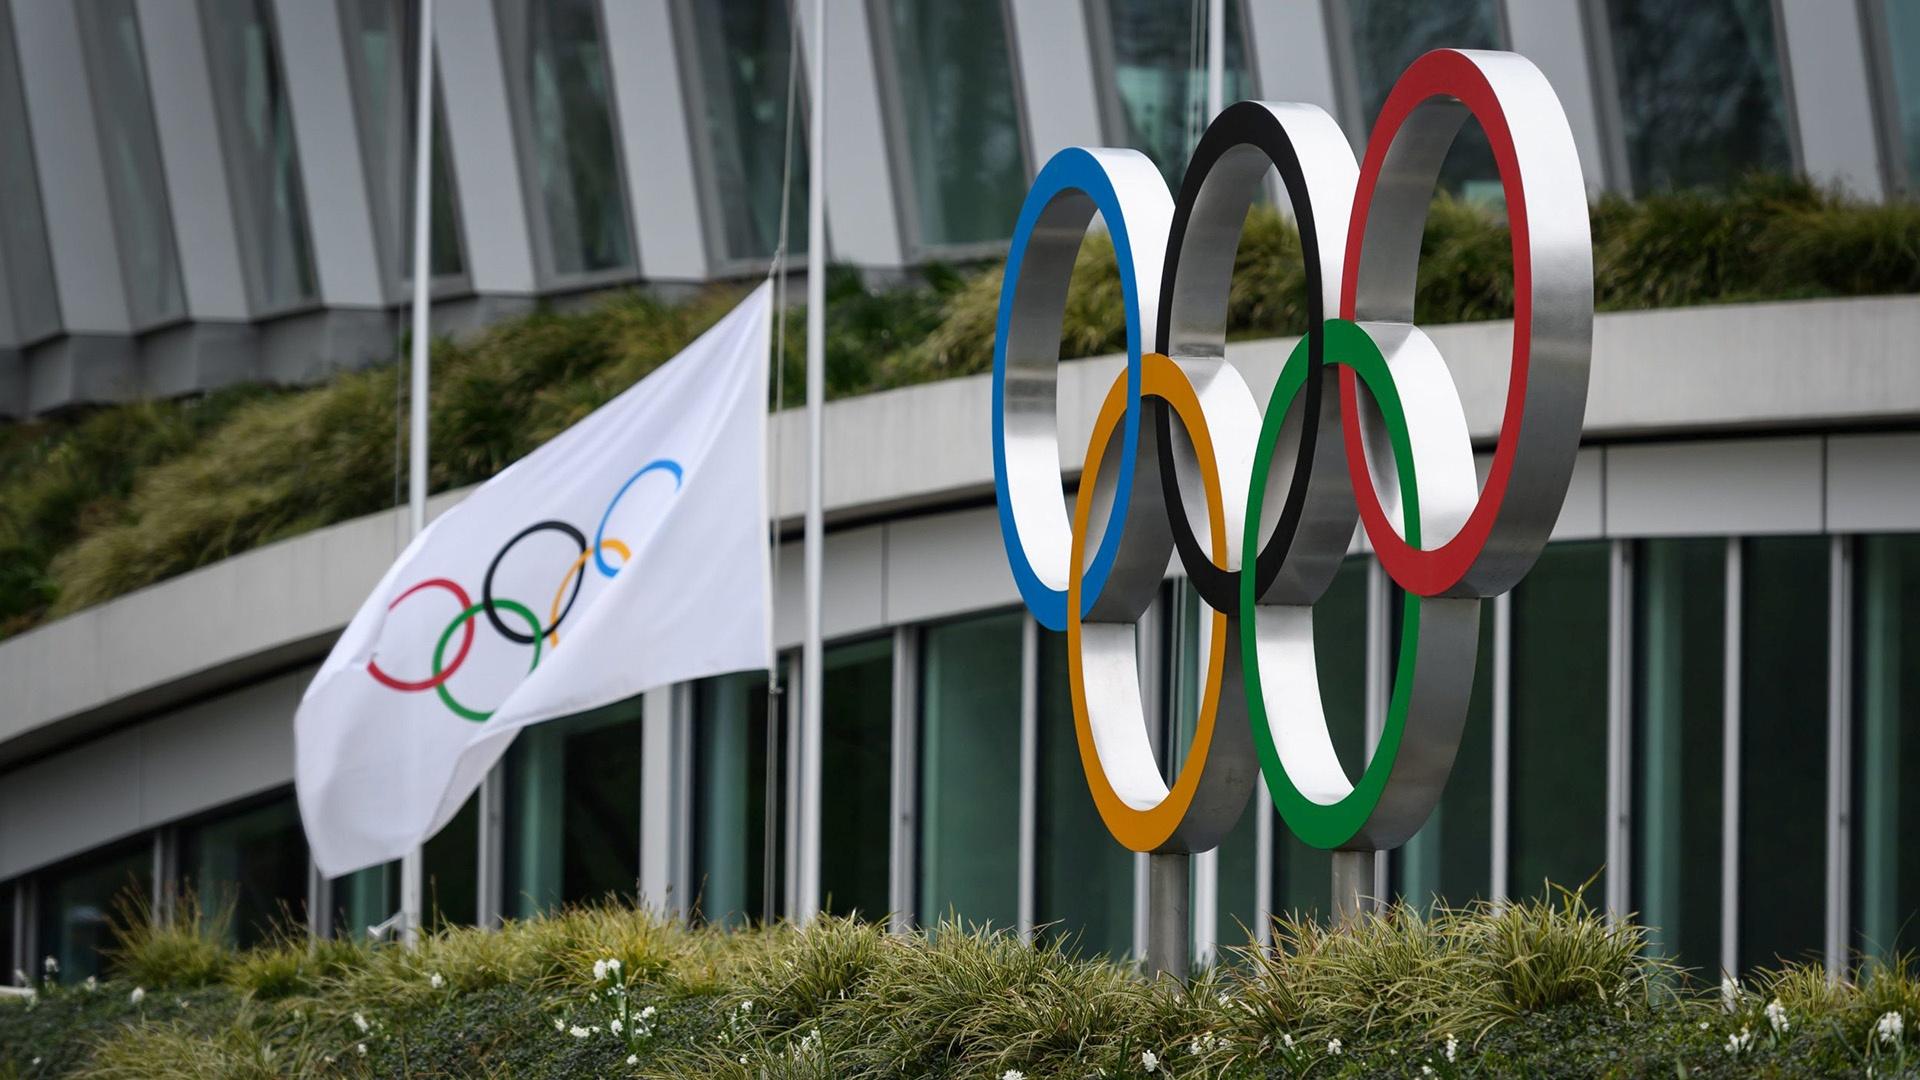 Tokyo 2020 Olympics hd background